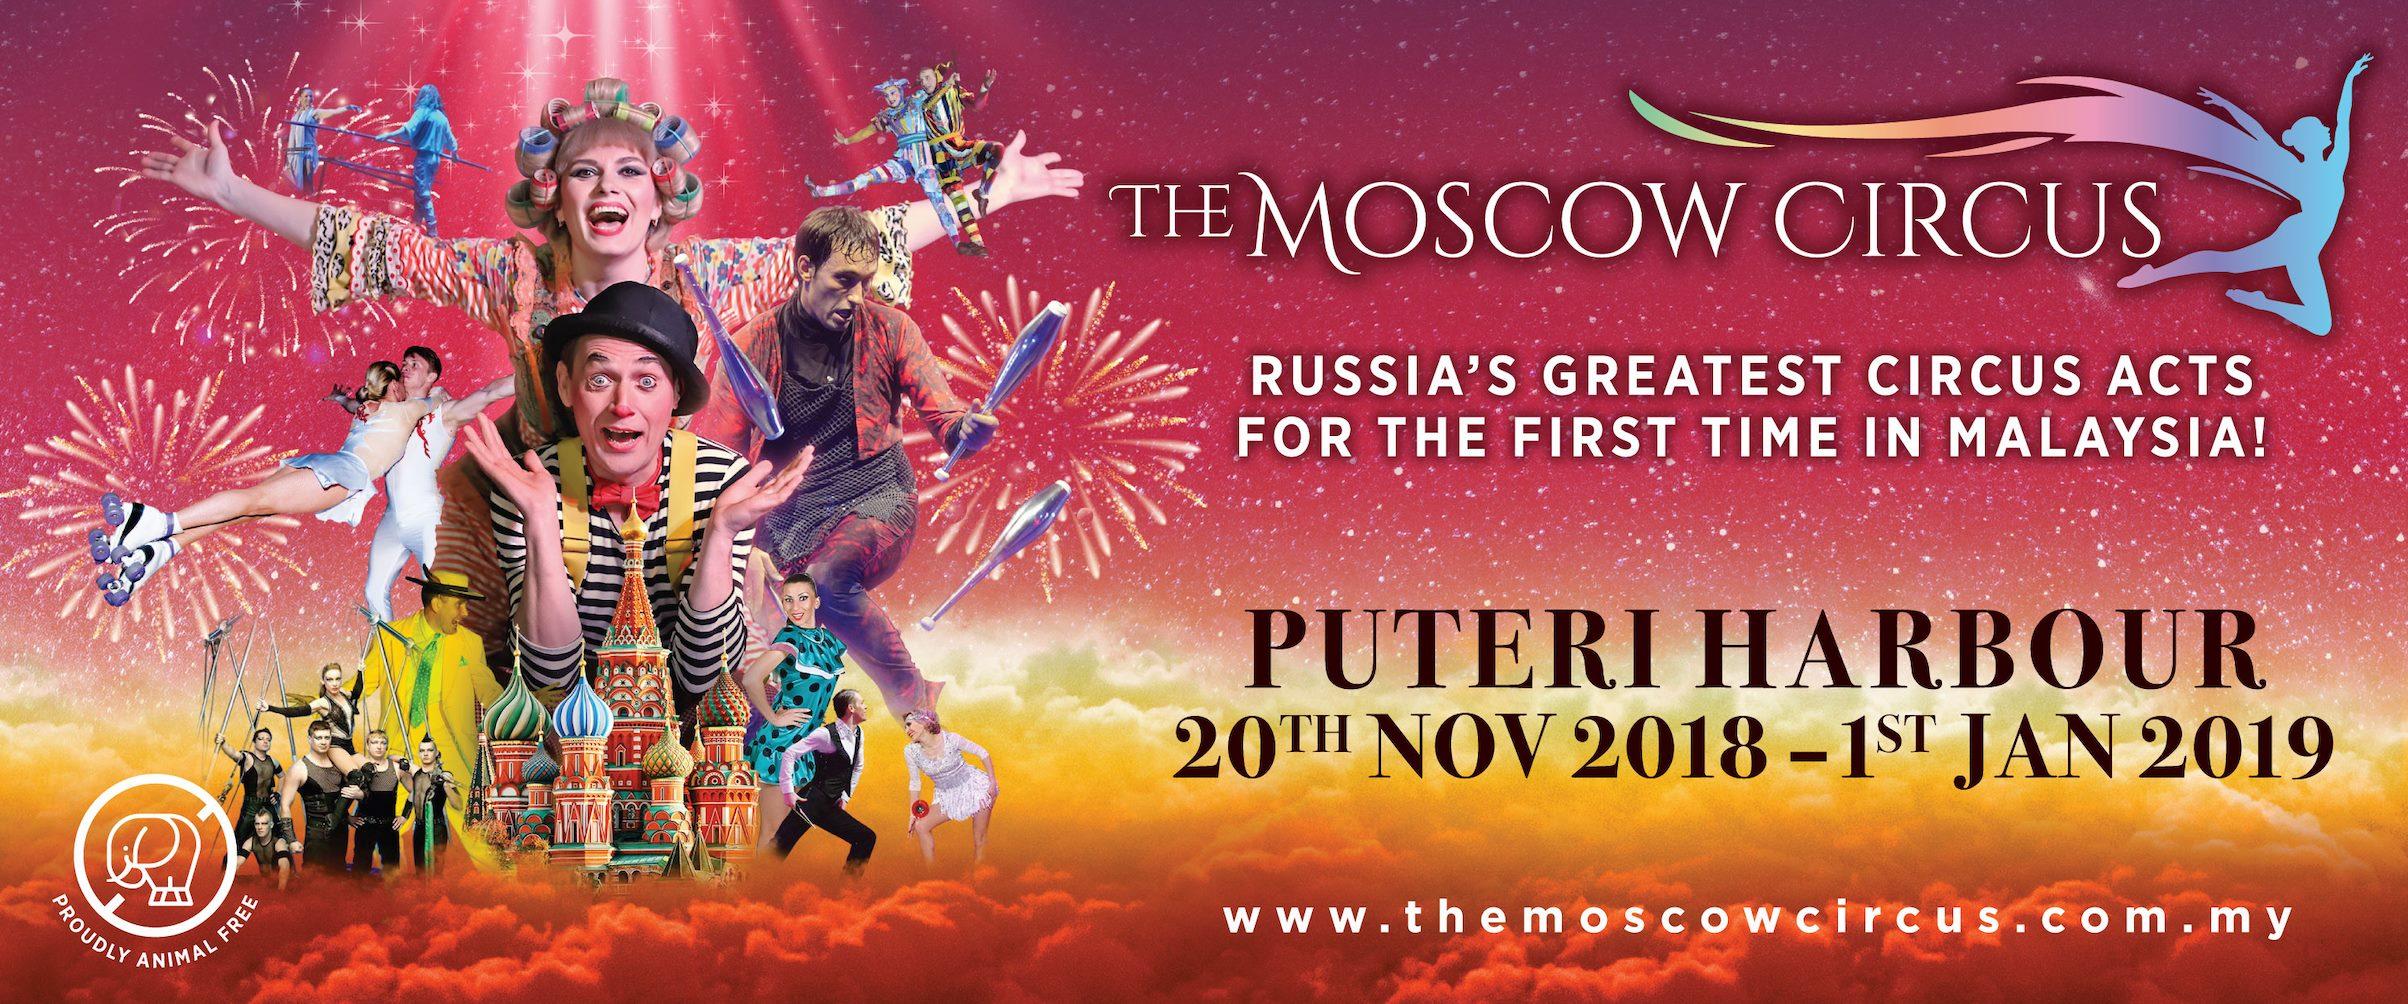 The Moscow Circus, Puteri Harbour Pertama Kali di Malaysia (20 Nov 2018 – 1 Jan 2019)